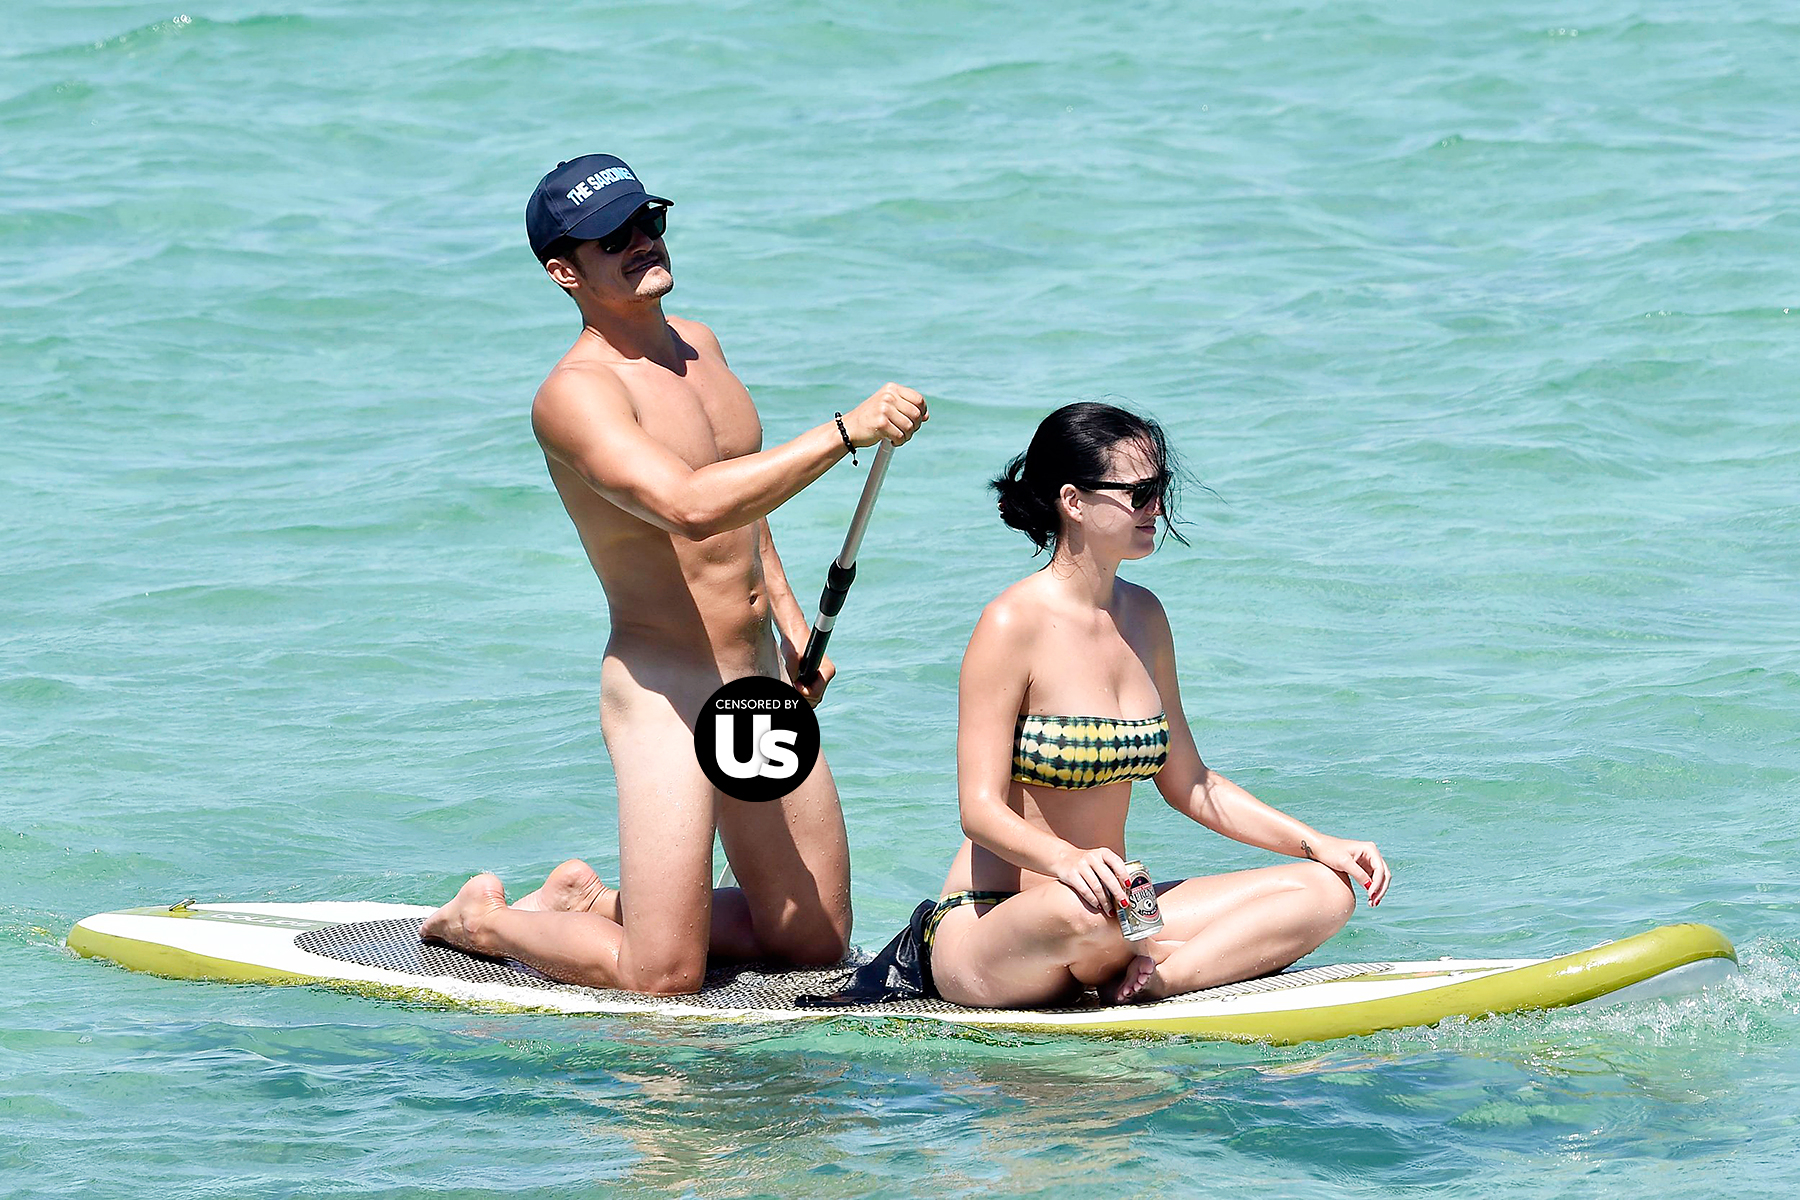 Orlando Bloom Katy Perry paddleboarding